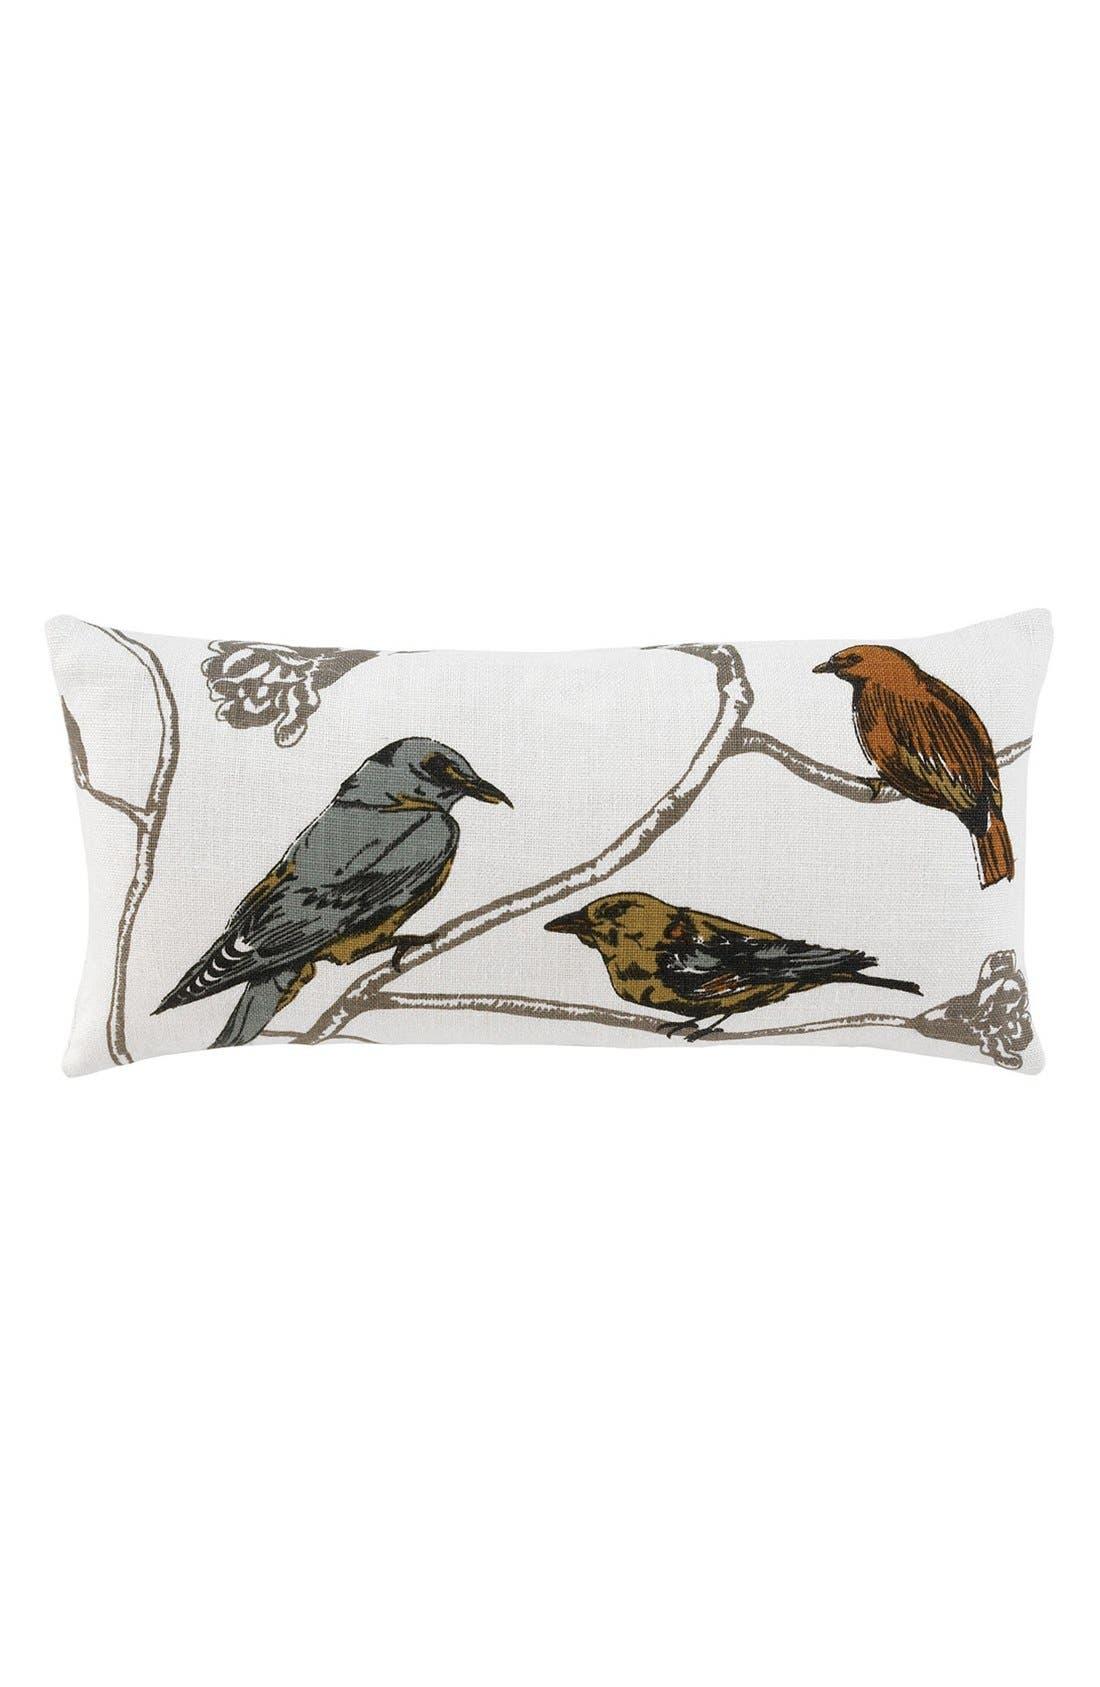 DwellStudio 'Chinoiserie' Decorative Pillow